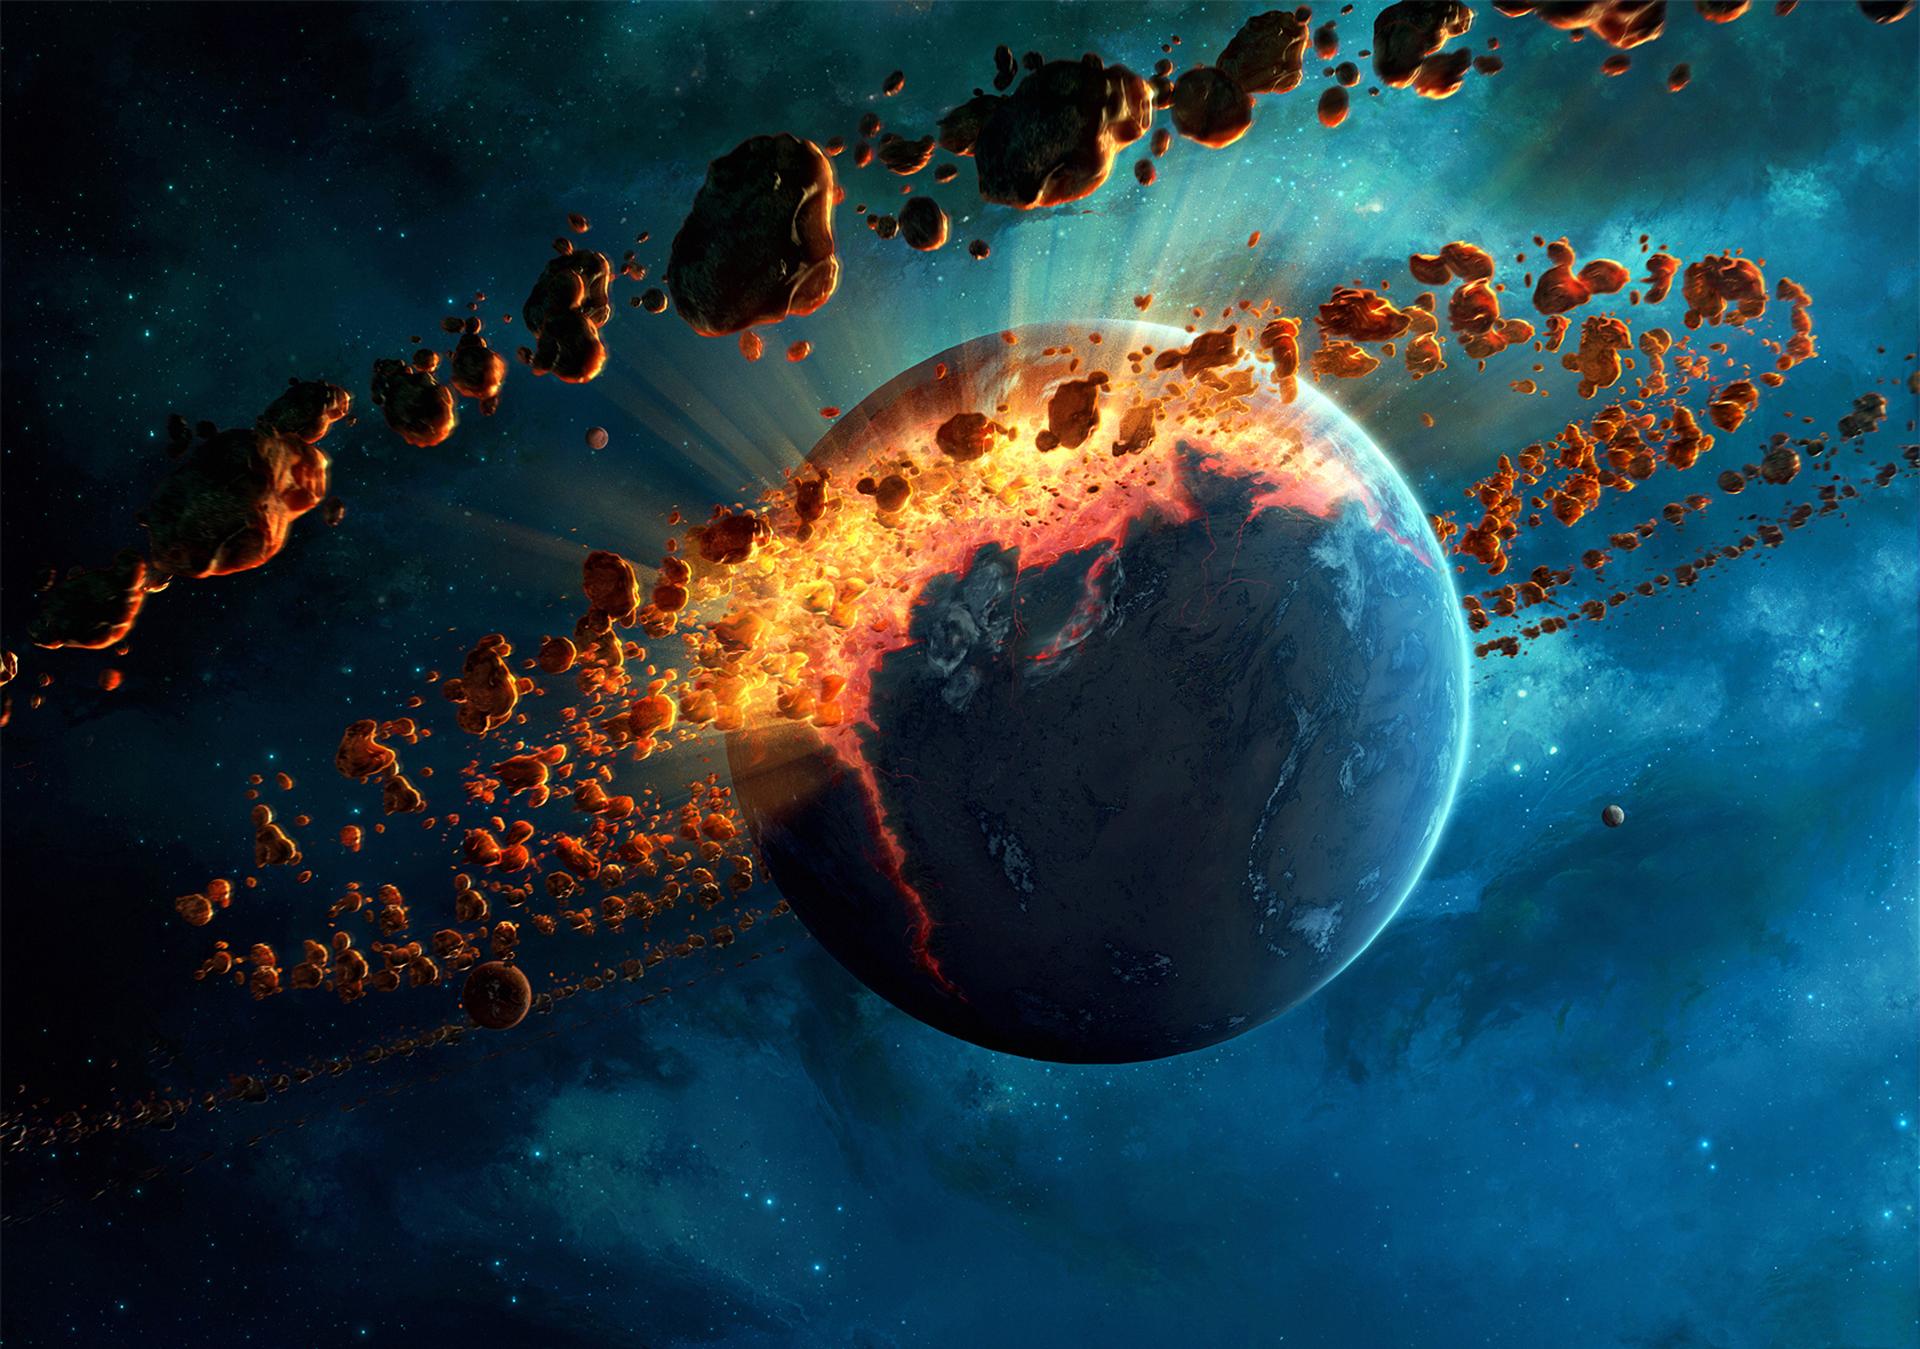 Фантастические картинки космоса